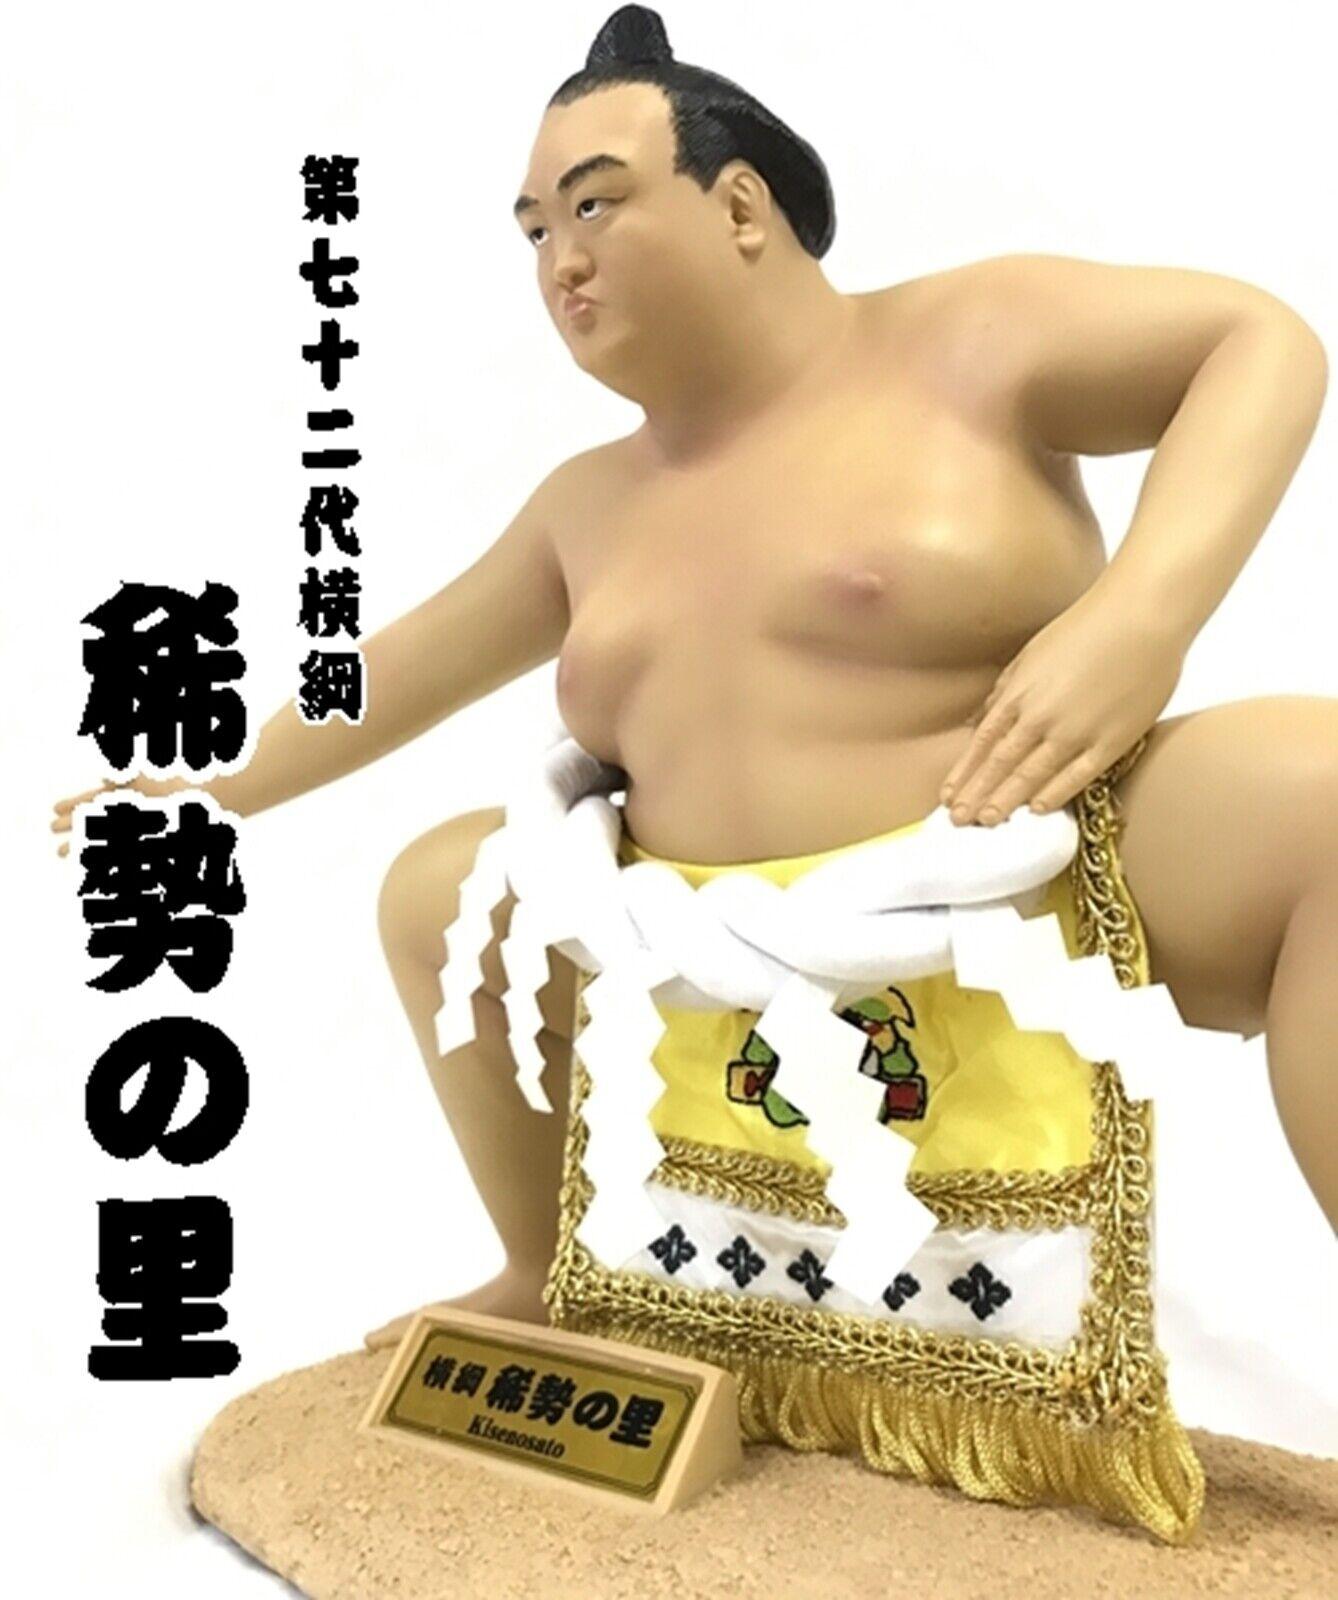 Sumo Wrestler Yokozuna cifra Kisenosato Champion Rikishi cifra Japan nuovo